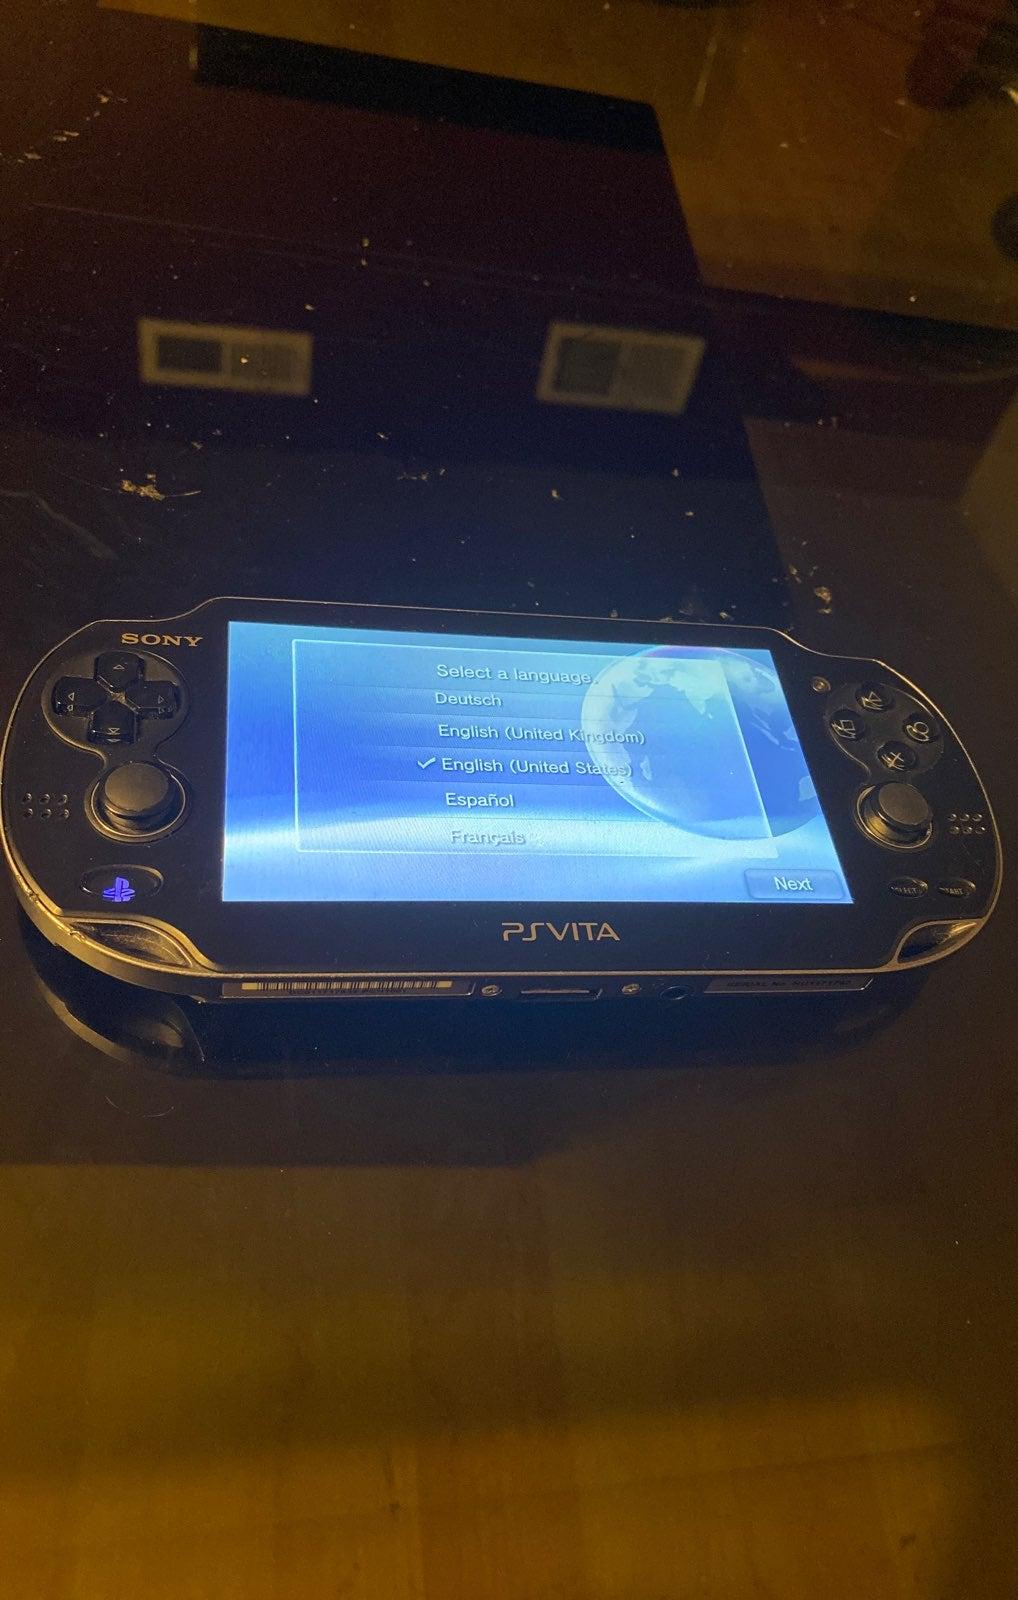 Sony PS Vita PCH 1001 Model Handheld